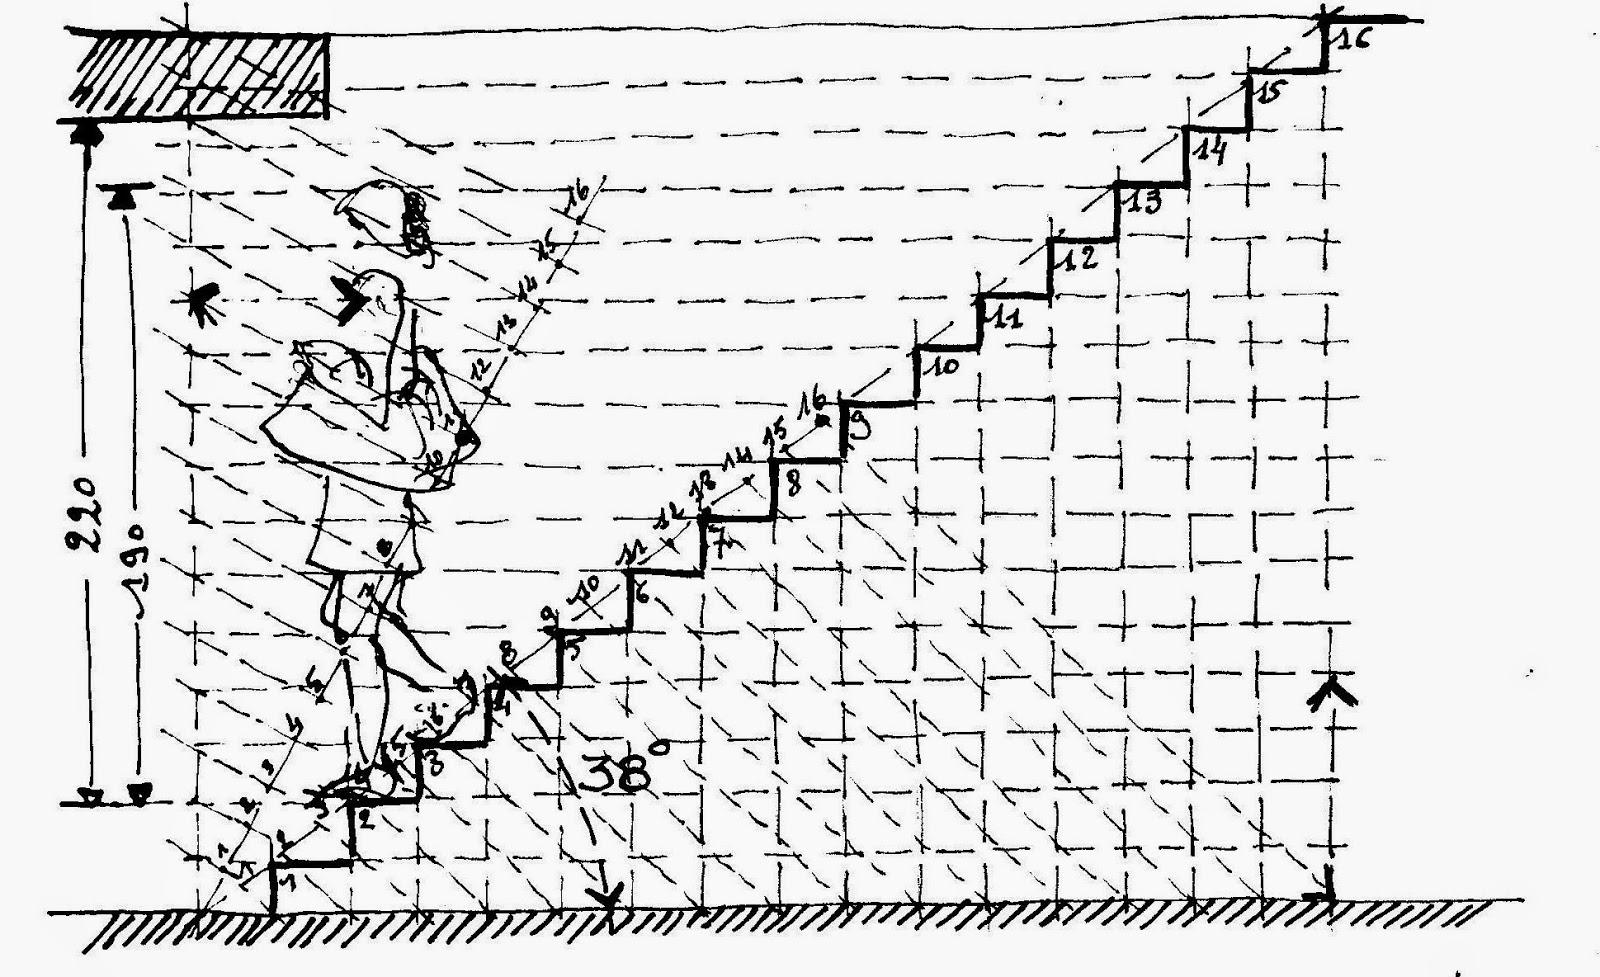 Bouwmaster trappen basisbegrippen for Hoogte trapleuning boven trap